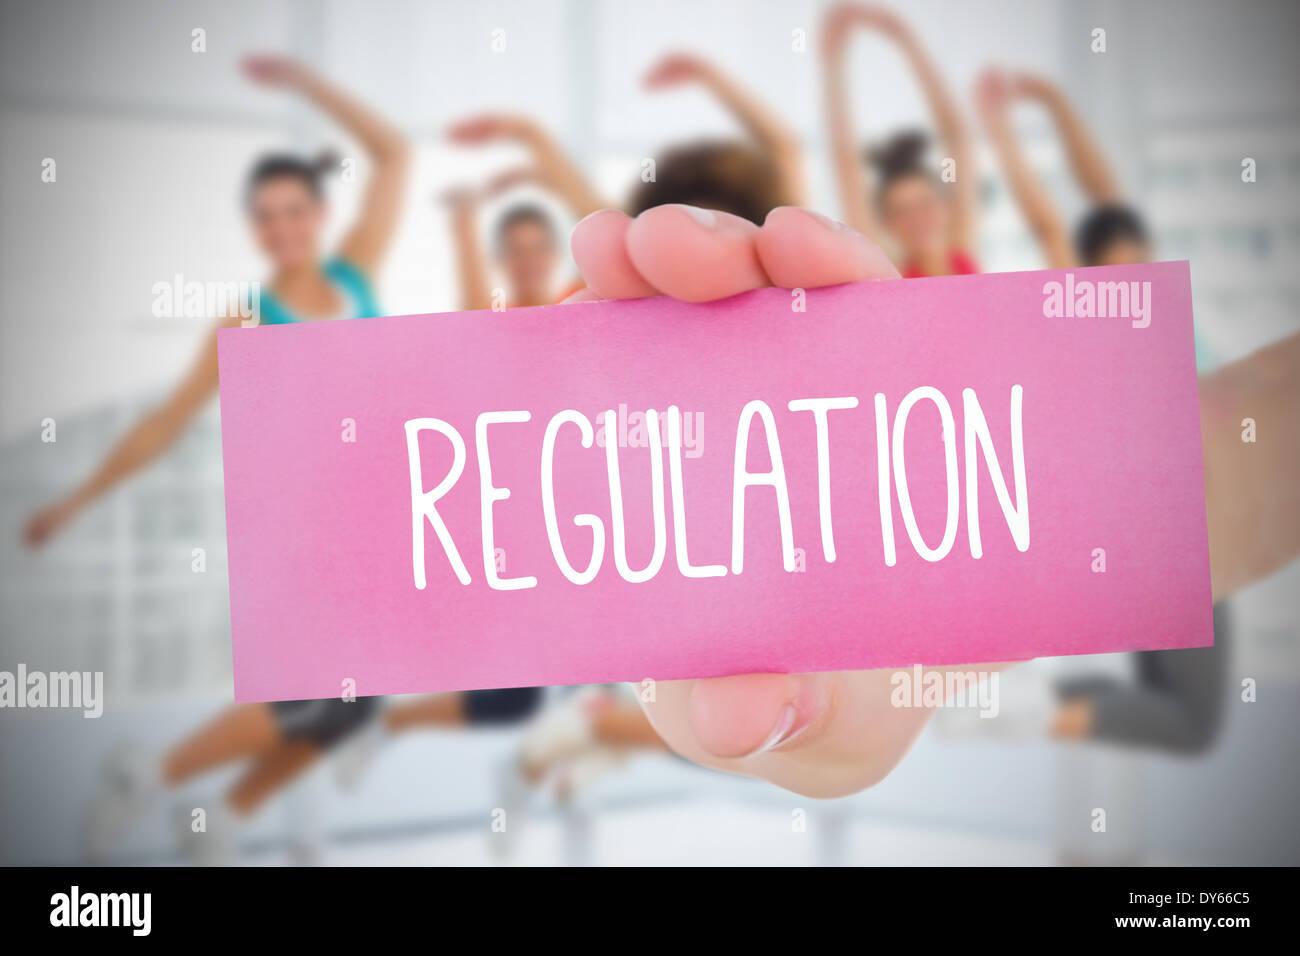 Woman holding pink card saying regulation - Stock Image